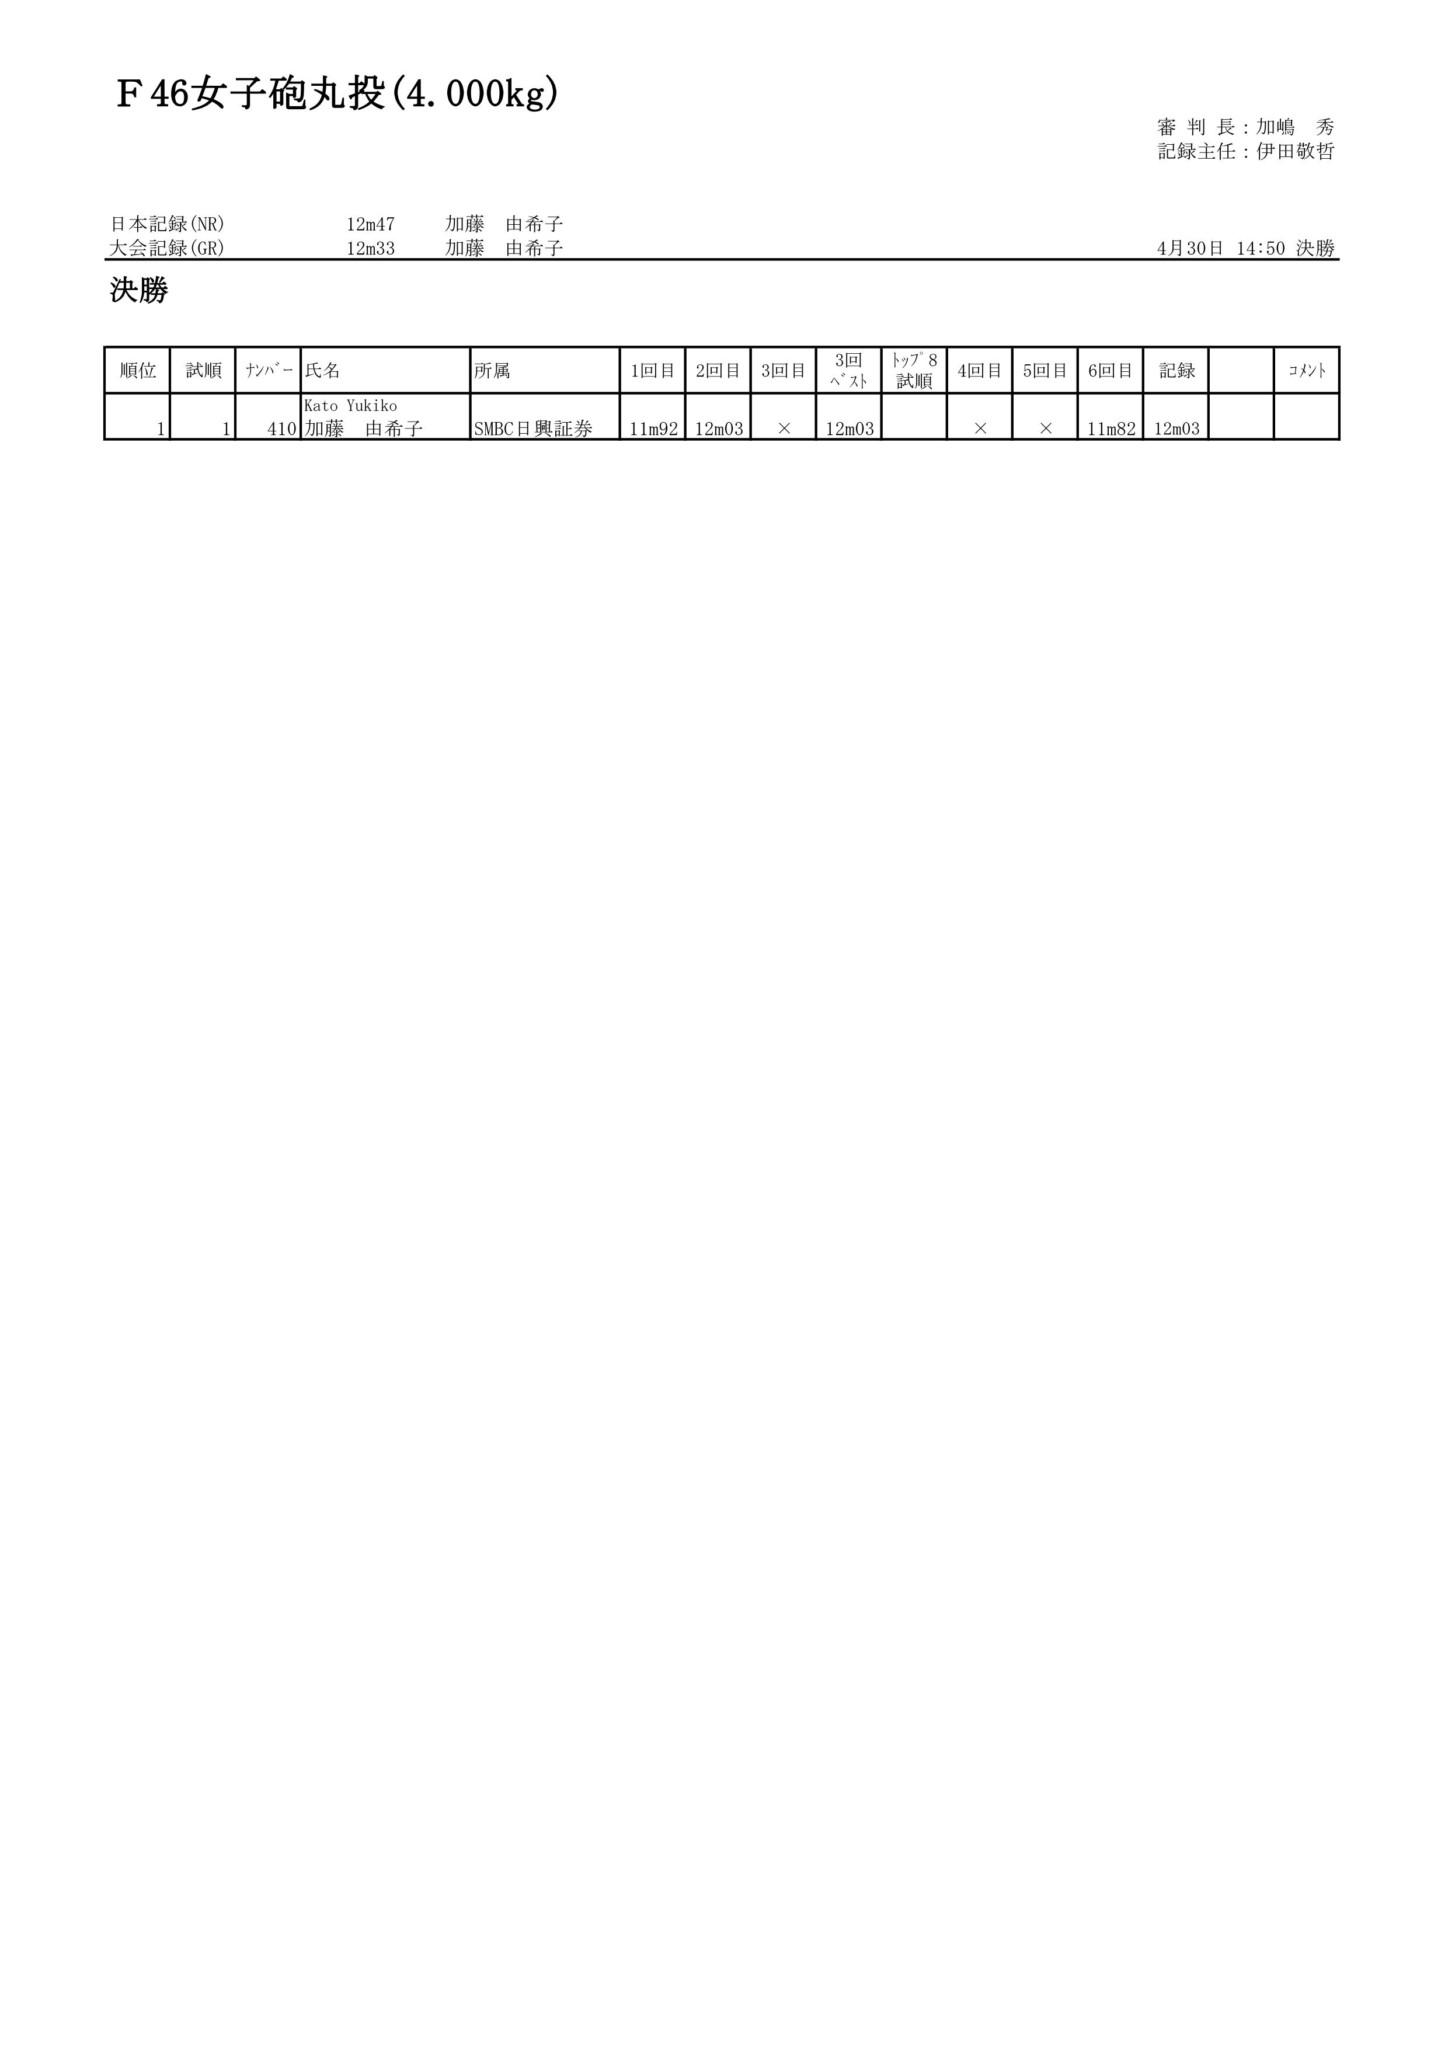 109F46女子砲丸投(4.000kg)_01